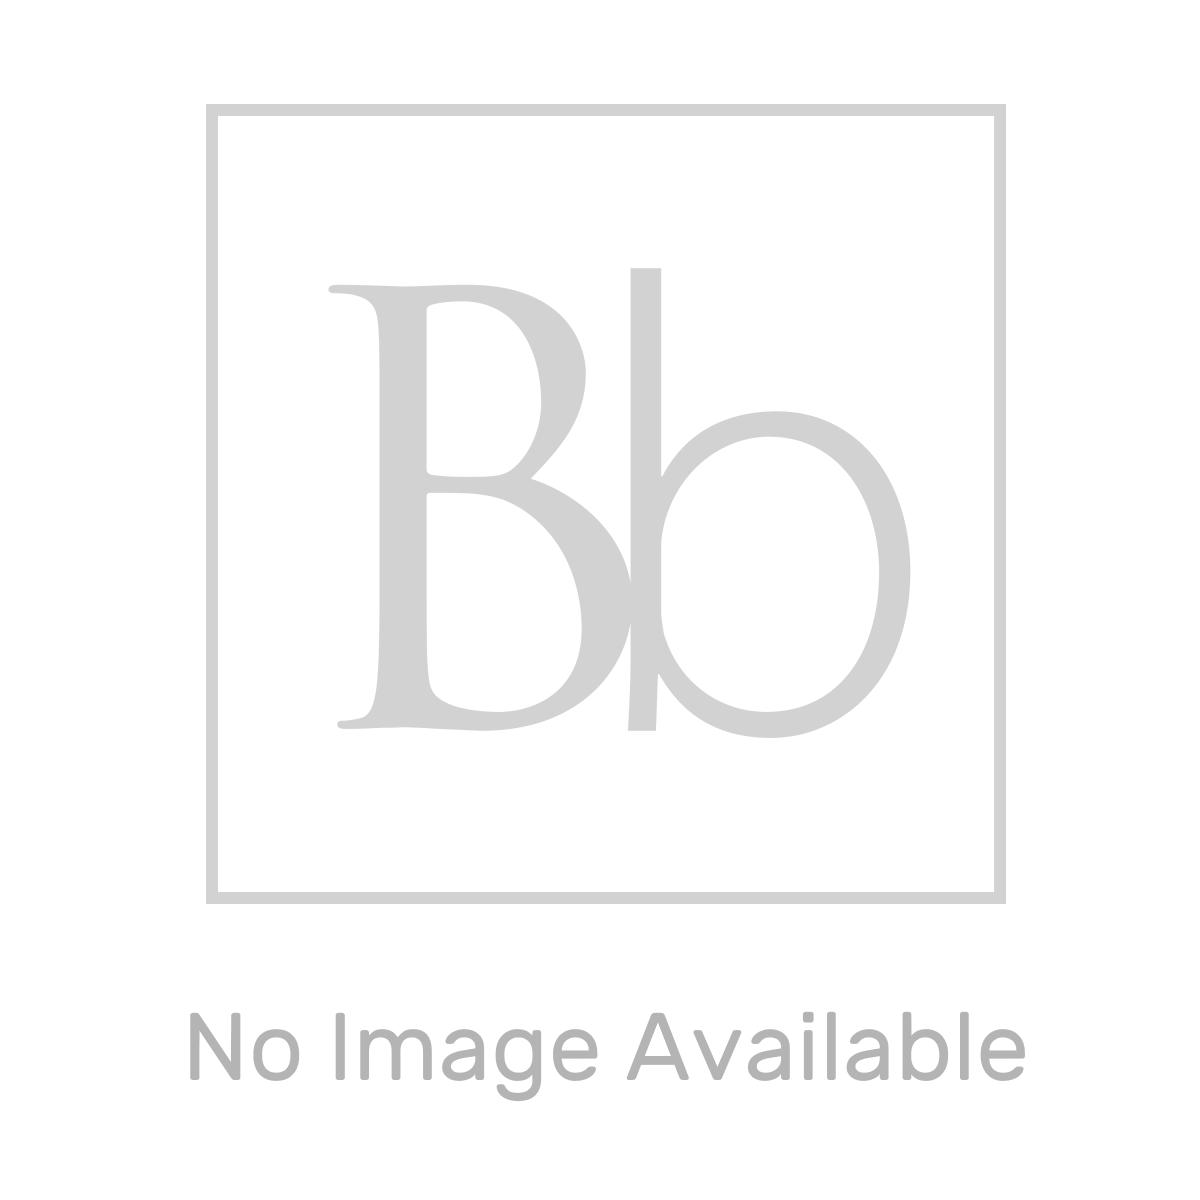 Merlyn Truestone White Square Shower Tray 900 x 900mm